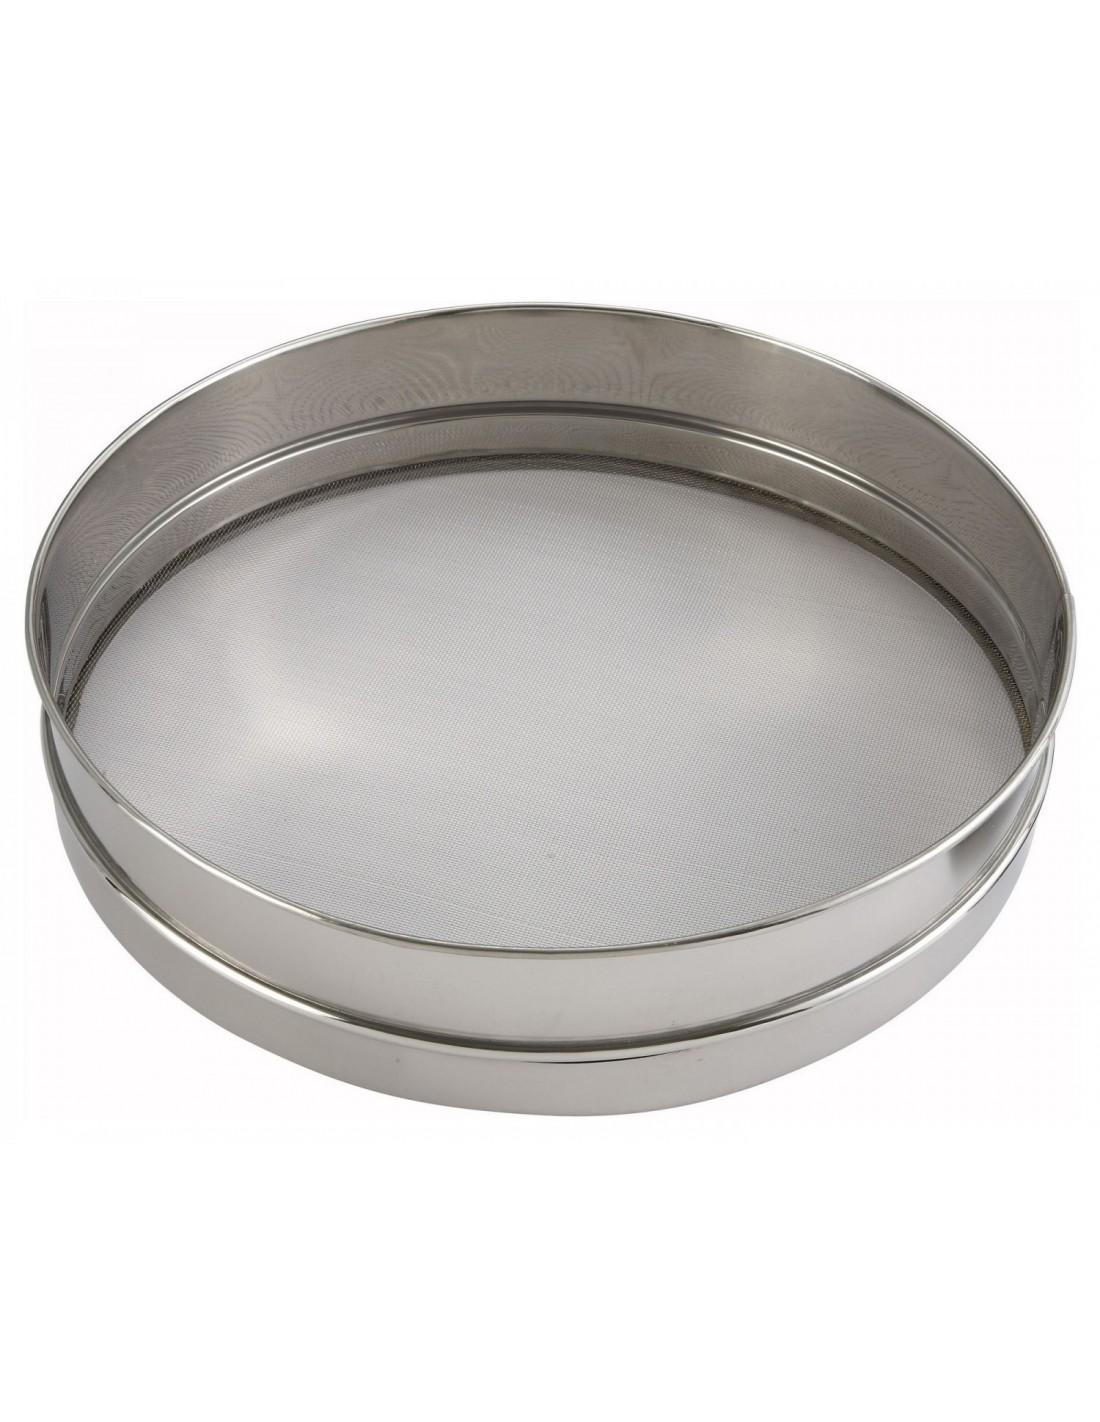 Tamiz Cernidor Redondo Para Harina Winco Siv 12